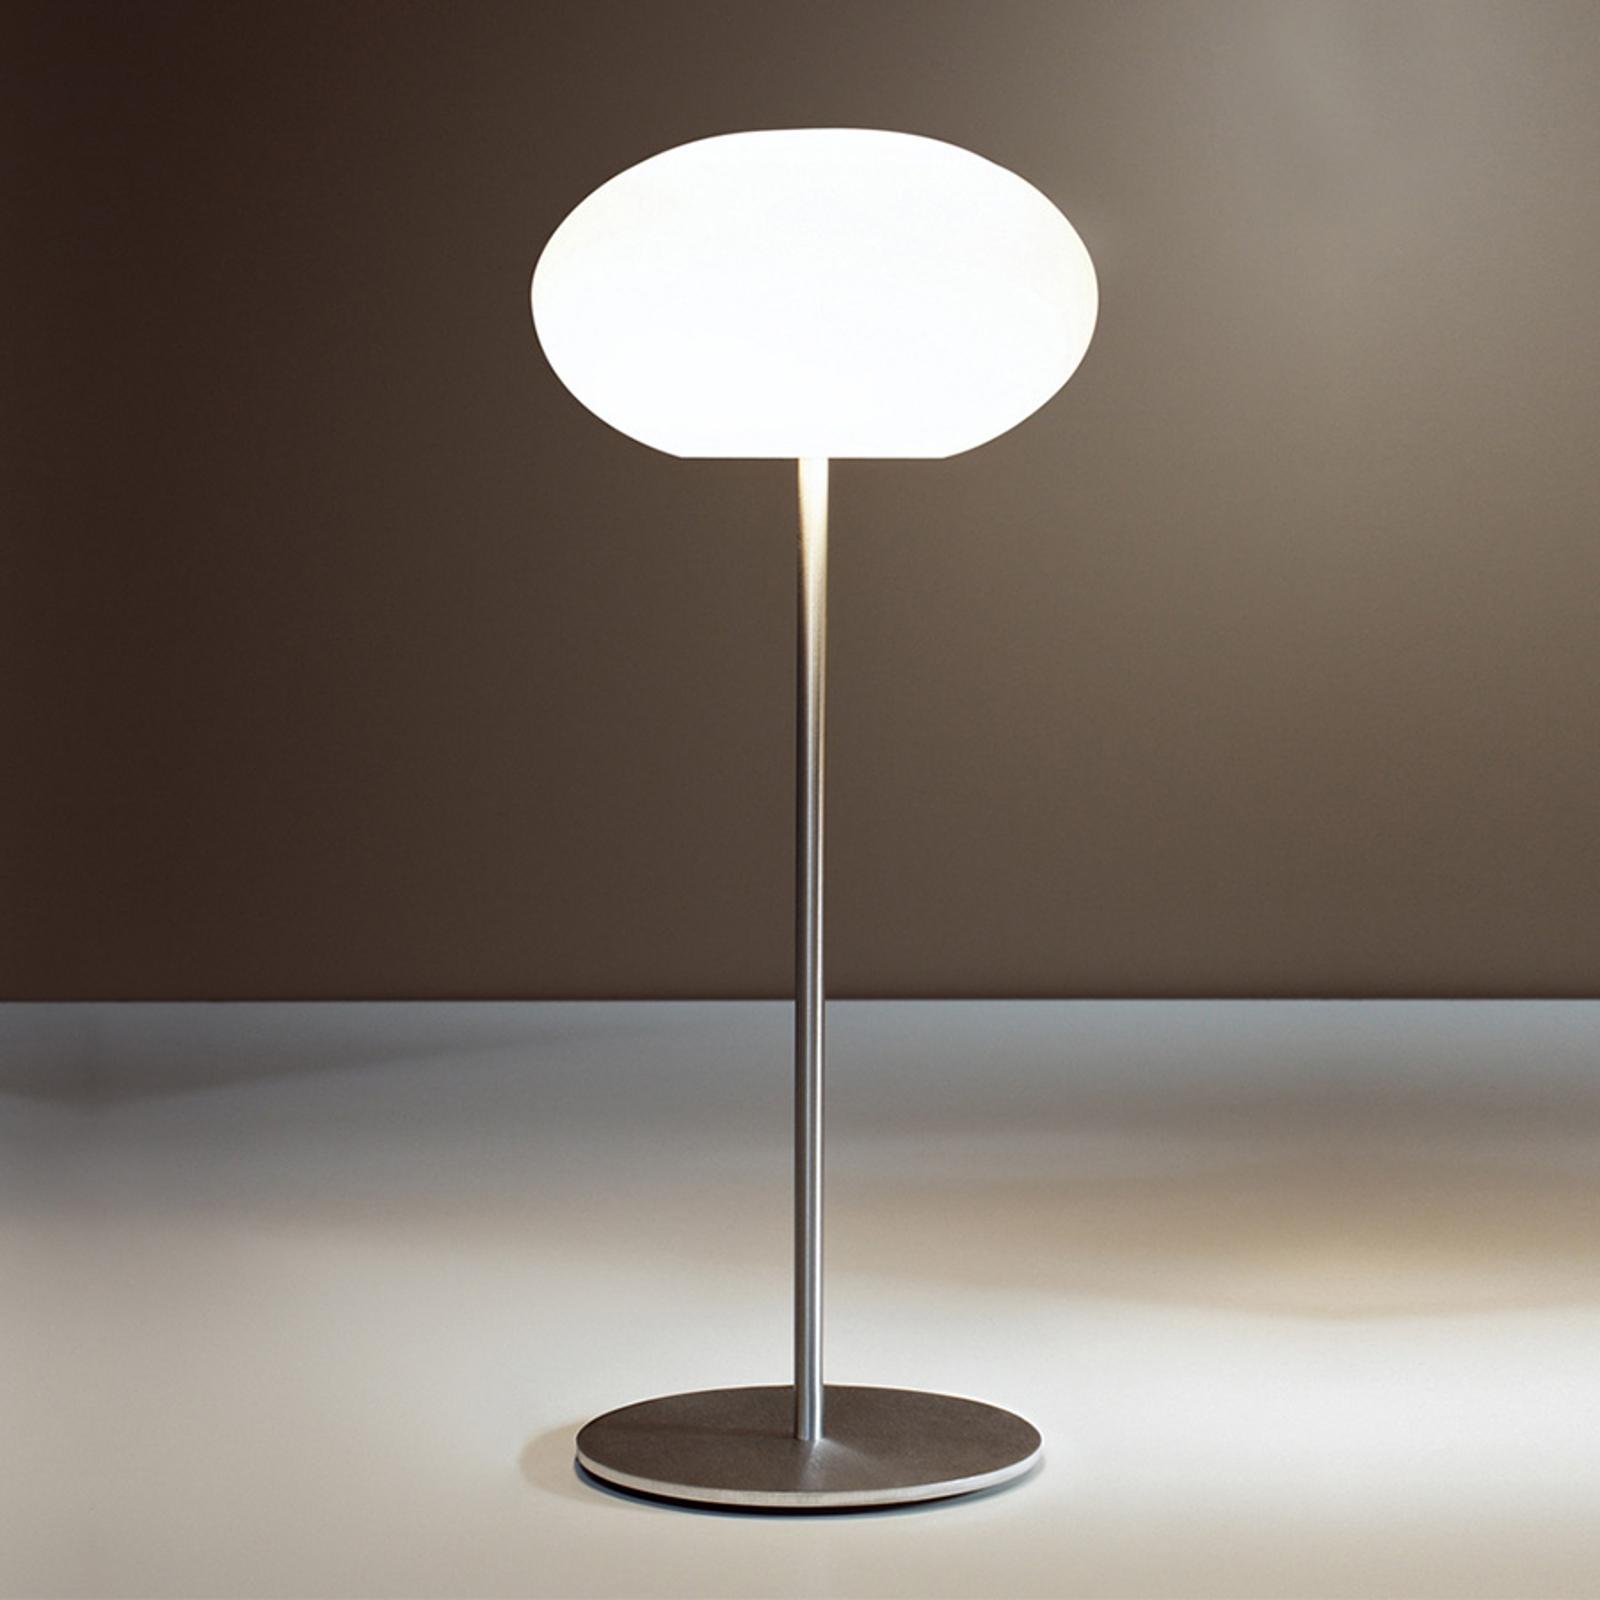 Casablanca Aih bordslampa, Ø 19 cm vit blankt